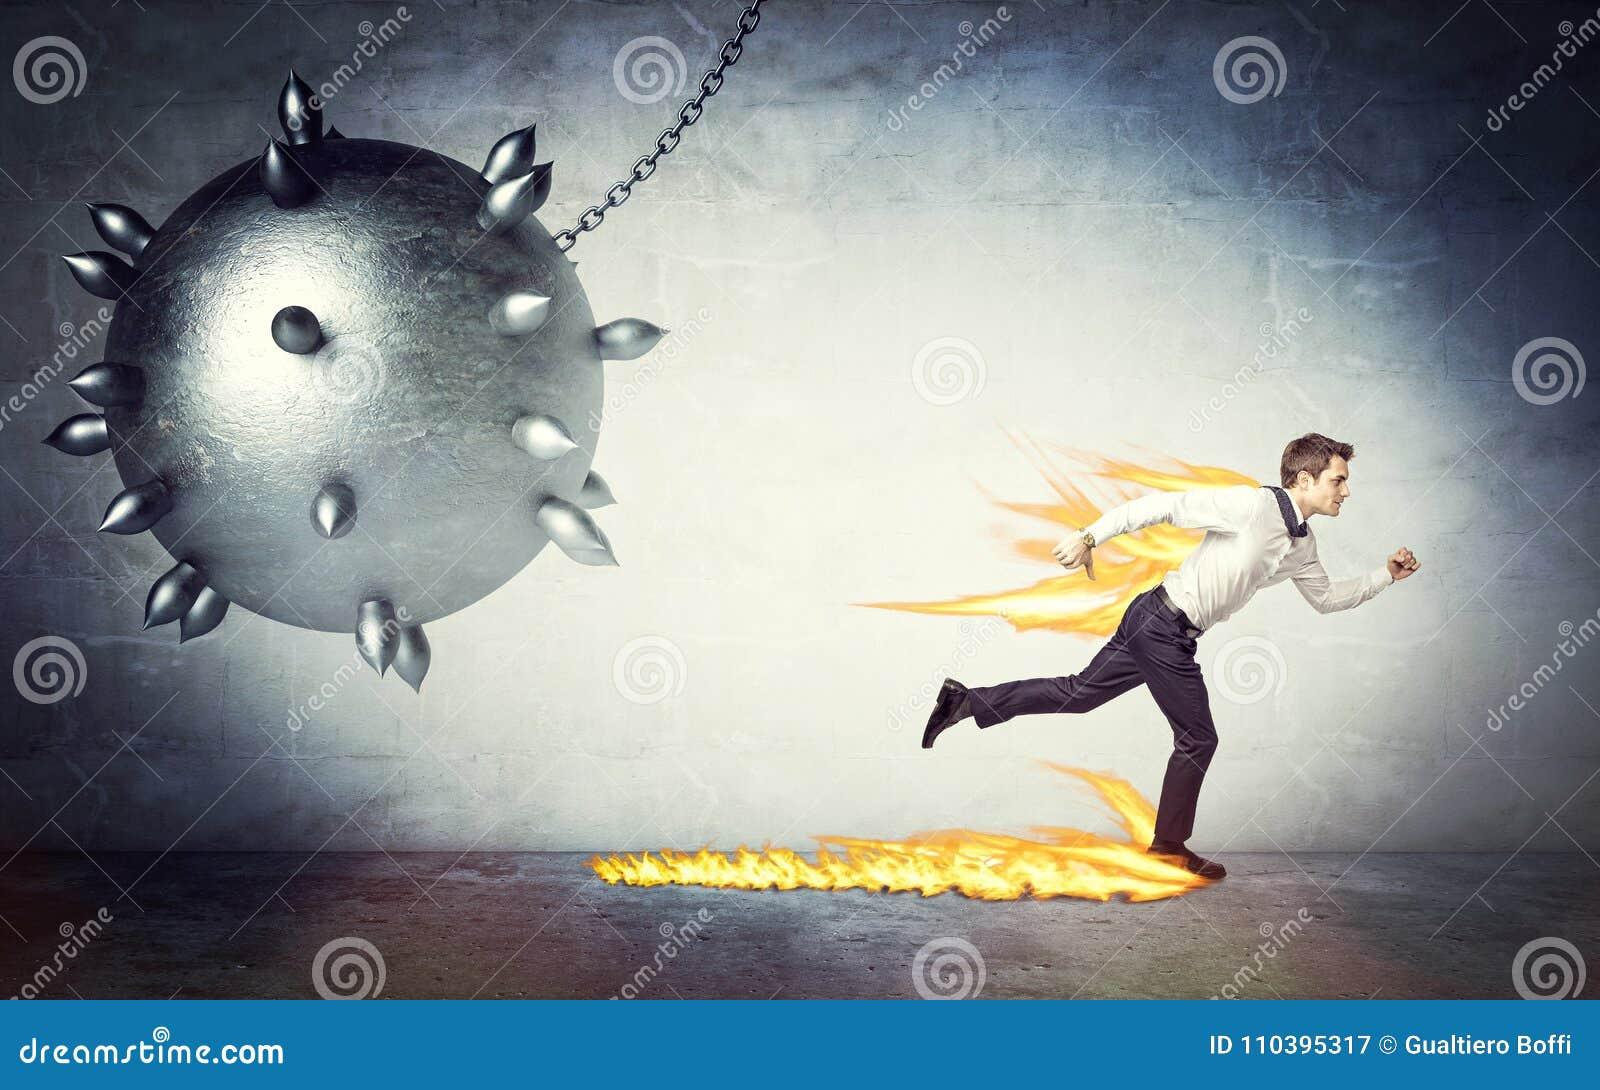 Man and demolition ball